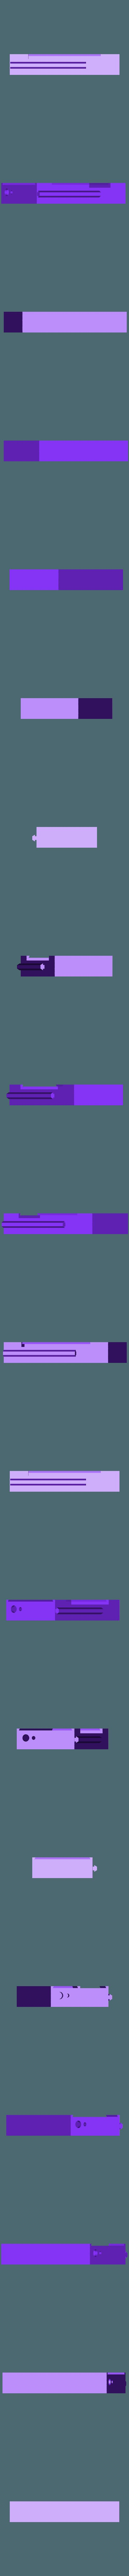 Scatola.stl Download free STL file Mosfet Box for 2020 / 2040 Aluminum Profiles • 3D printing design, Kliffom